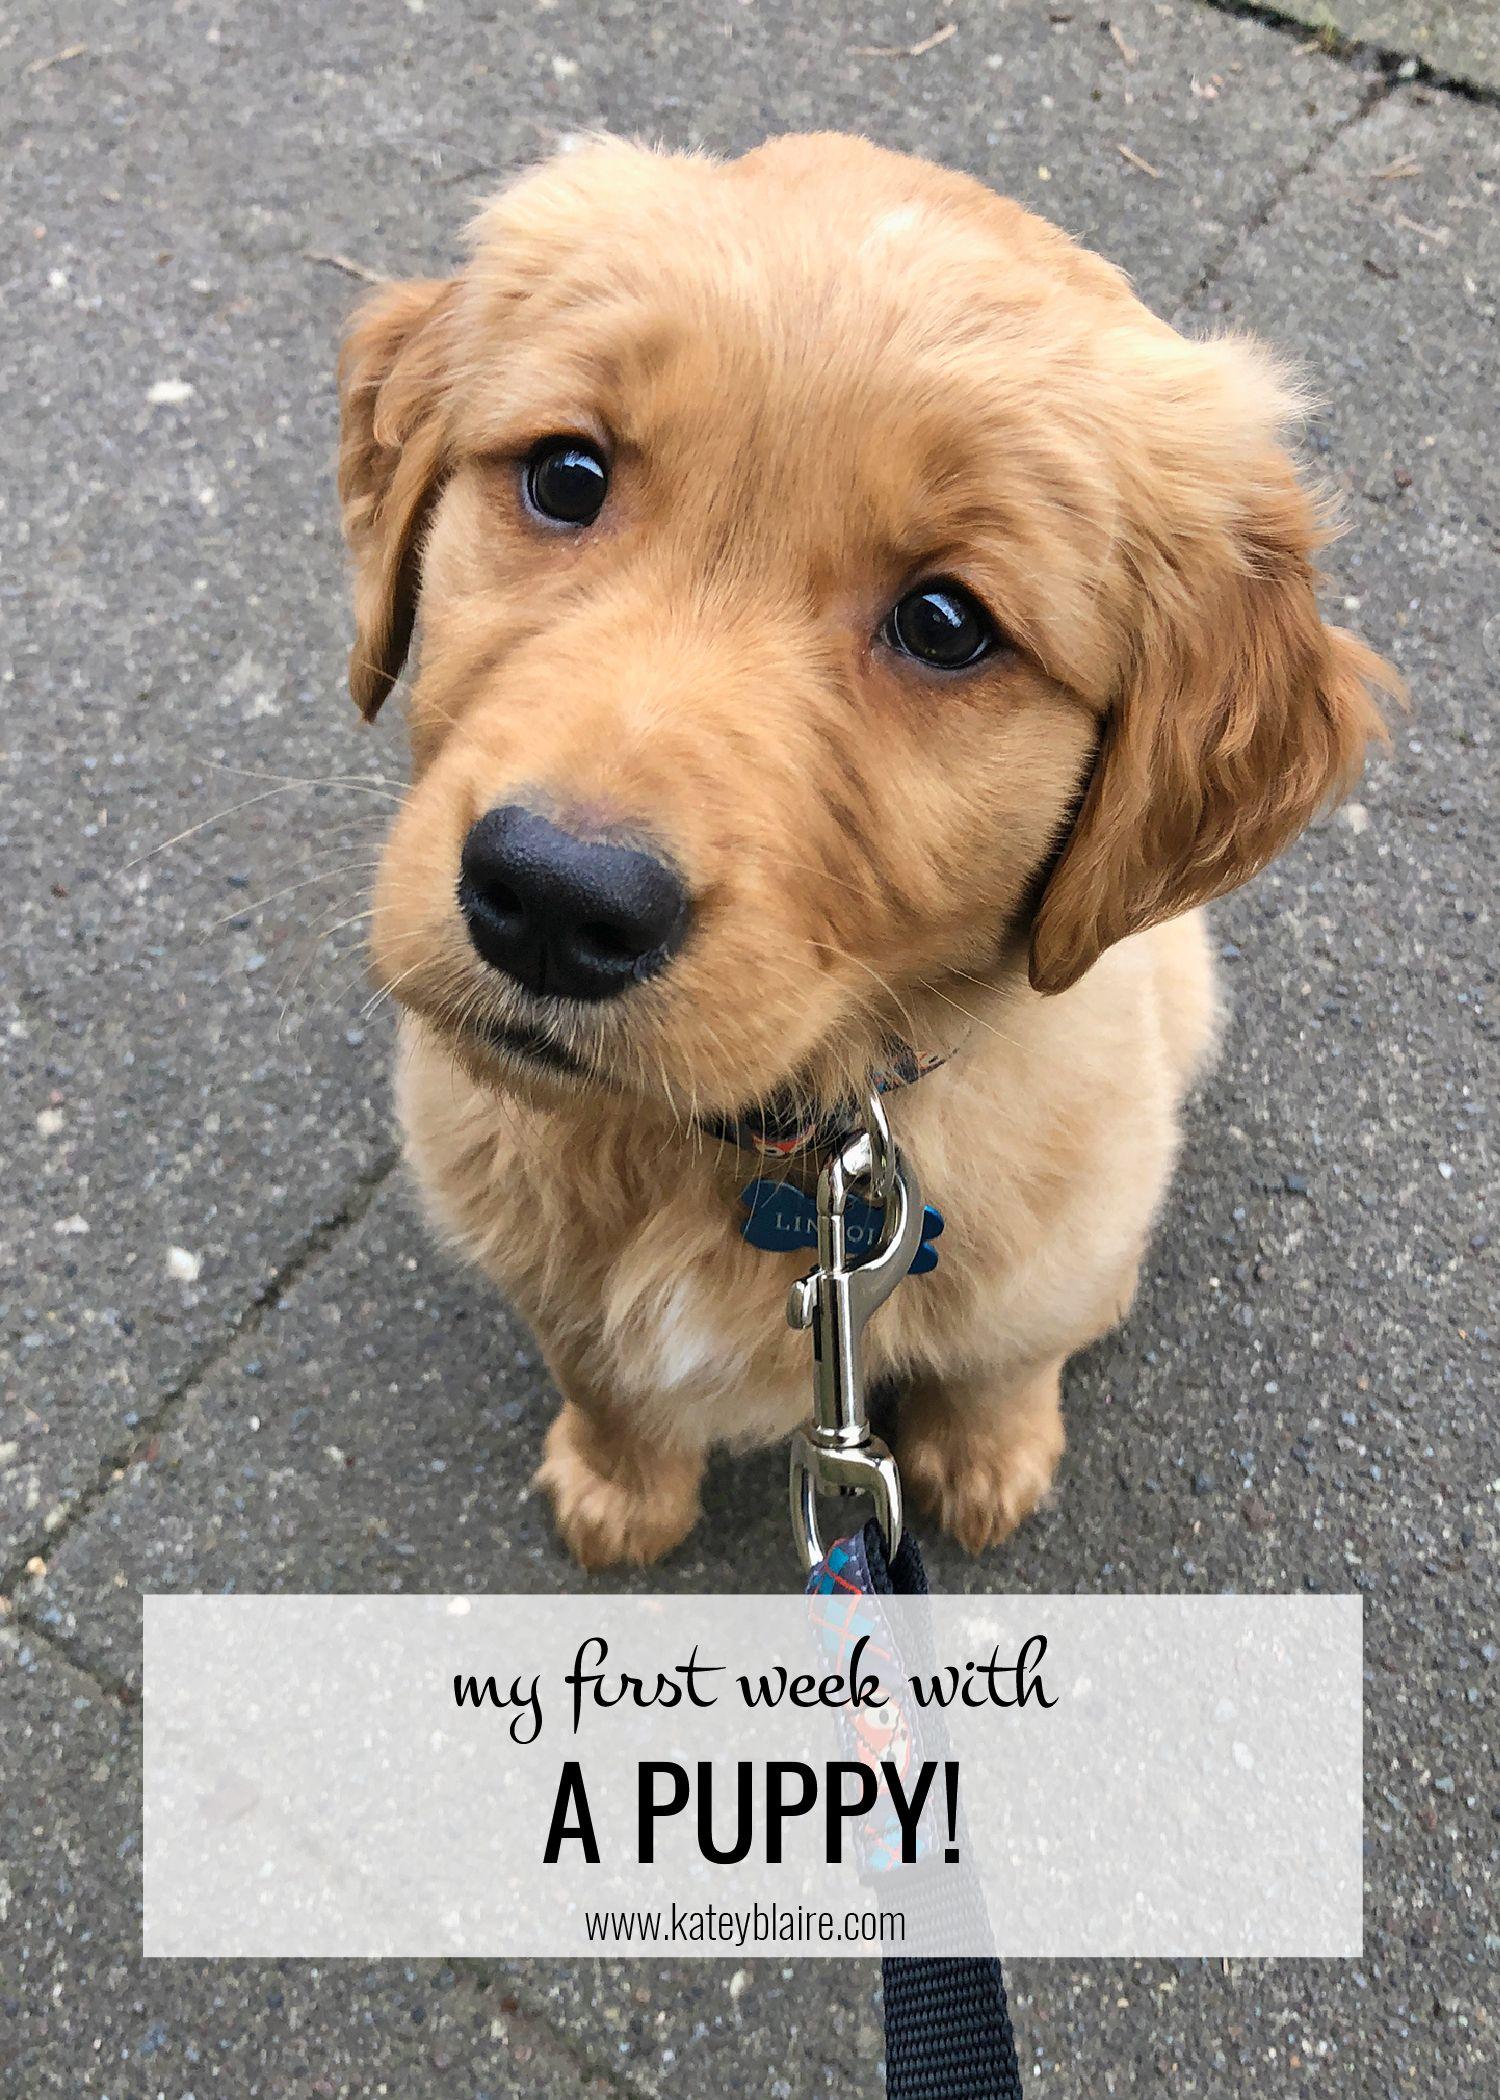 My First Week With A Puppy Puppies Dog Friends Retriever Puppy